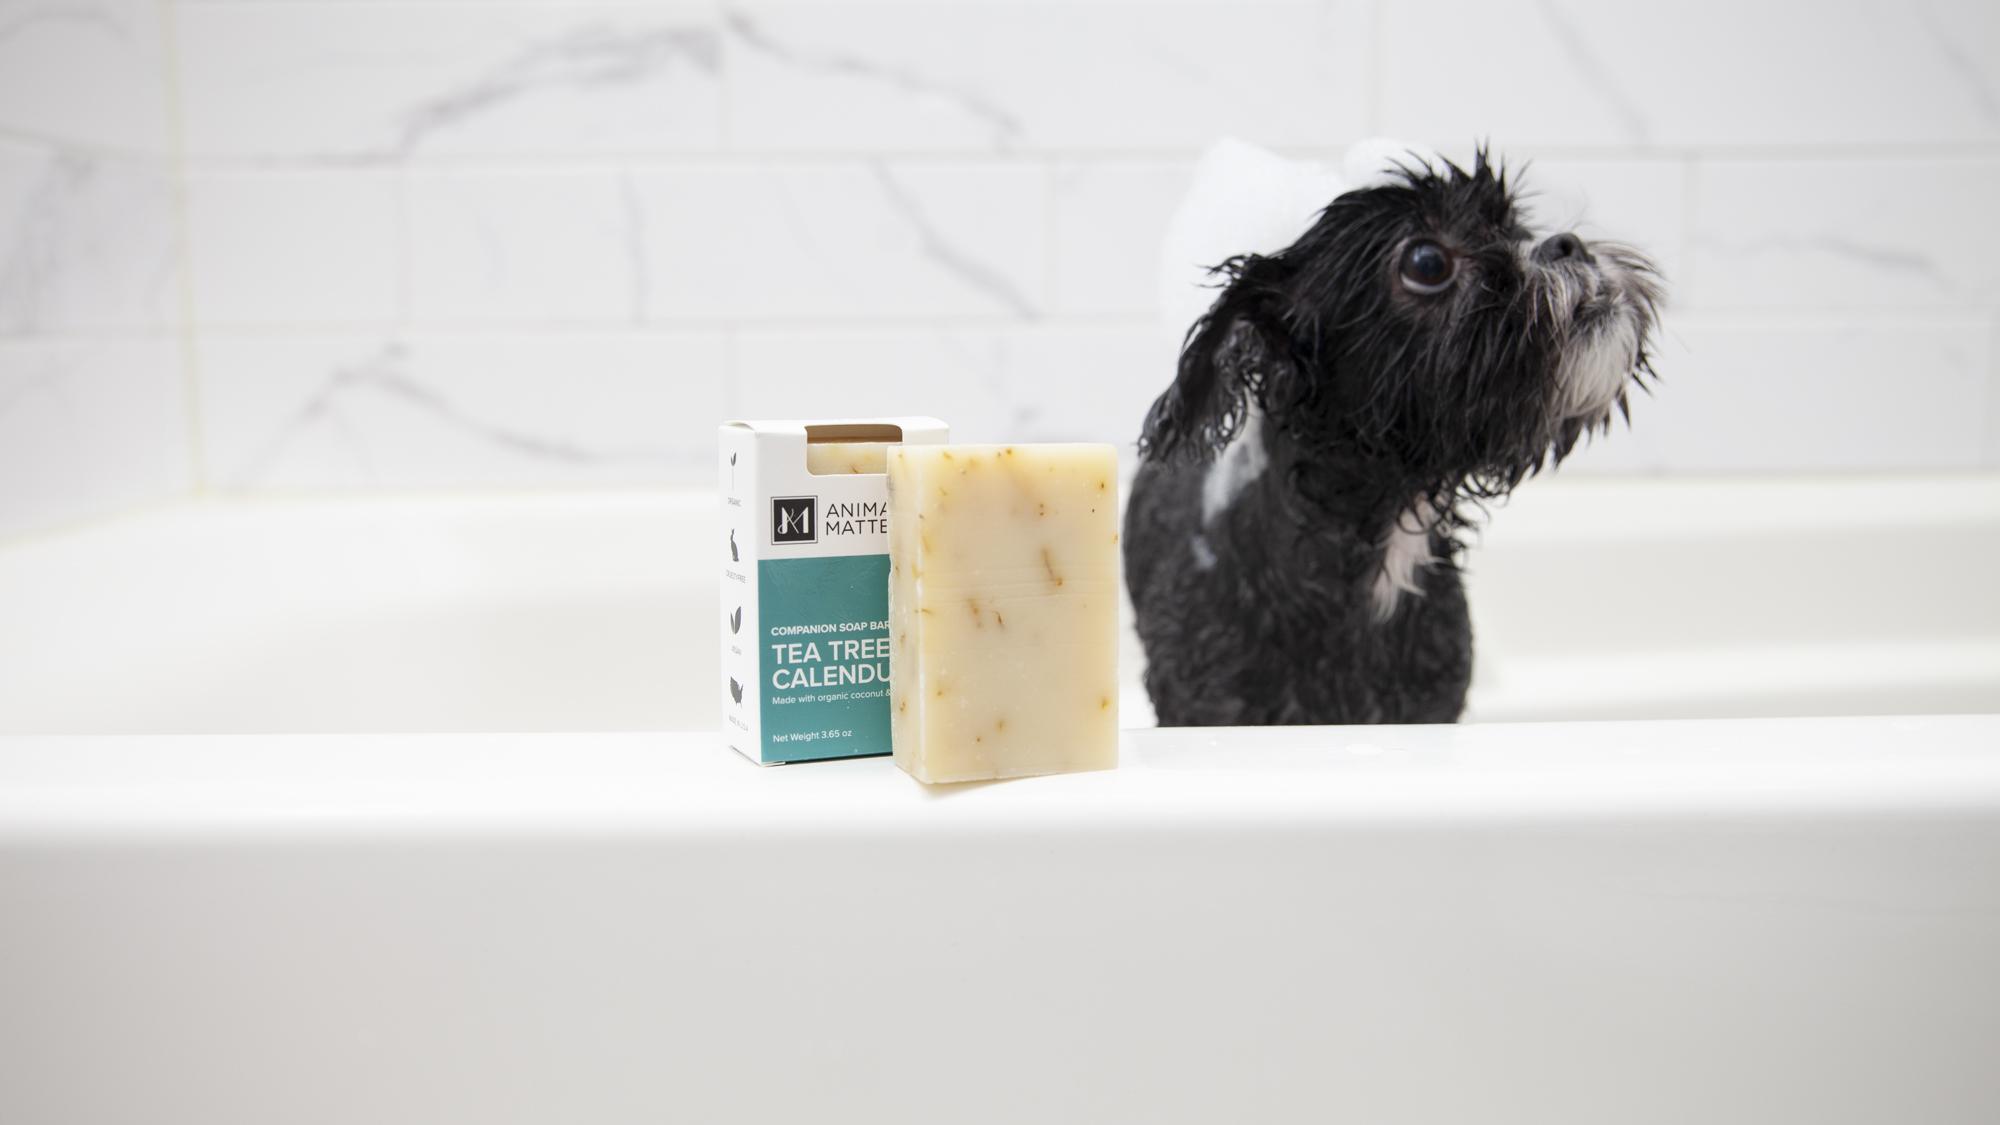 Animals Matter Companion Soap - Tea Tree and Calendula